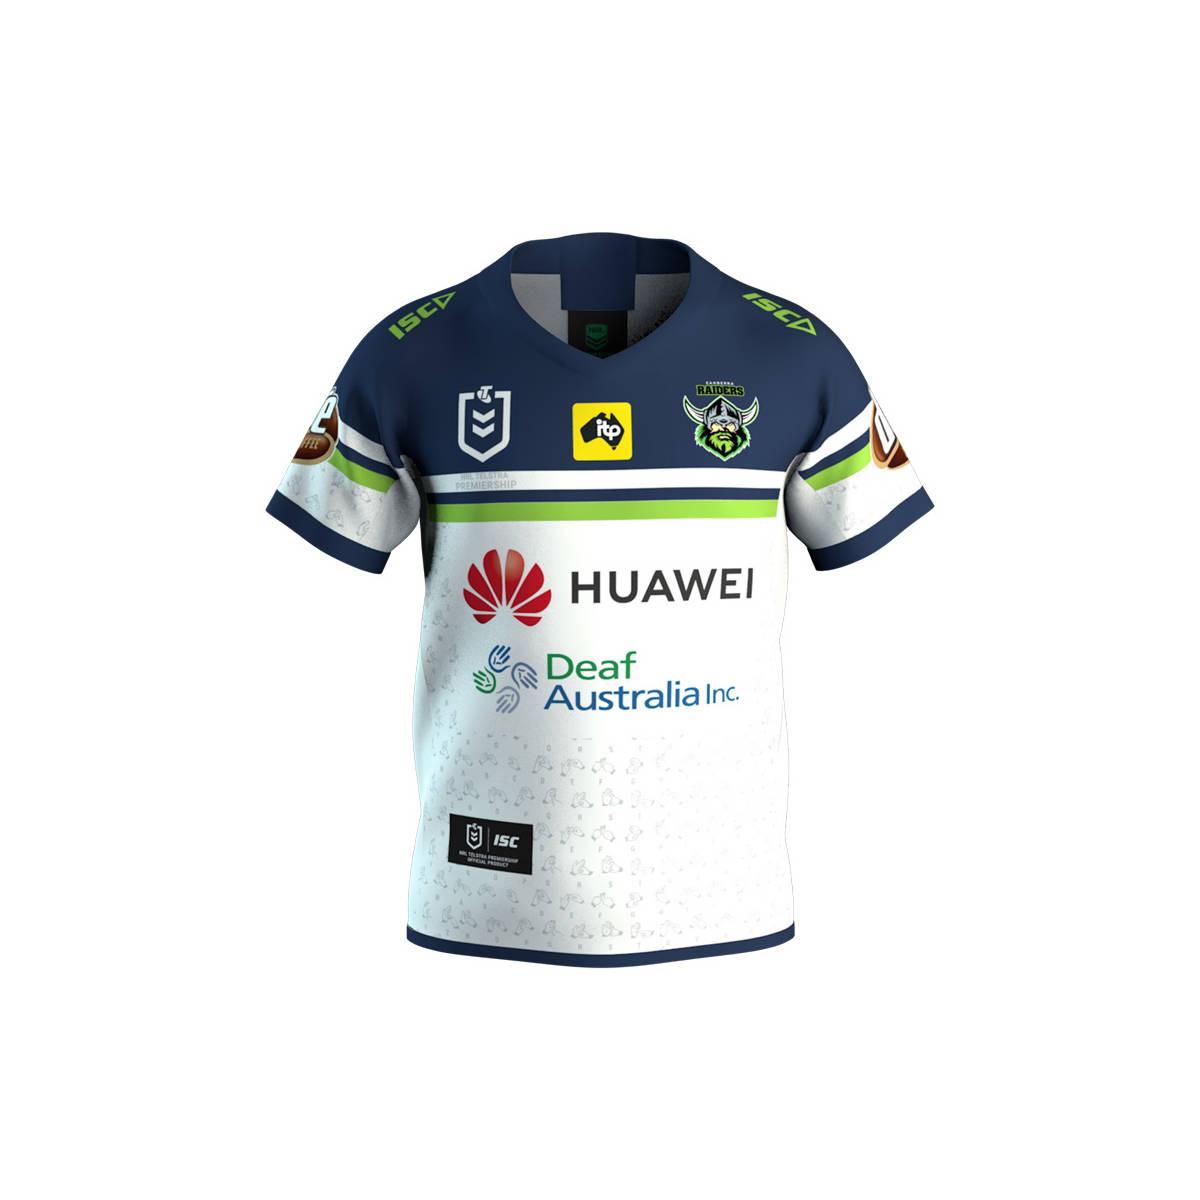 2019 Raiders Kids Huawei Charity Jersey0